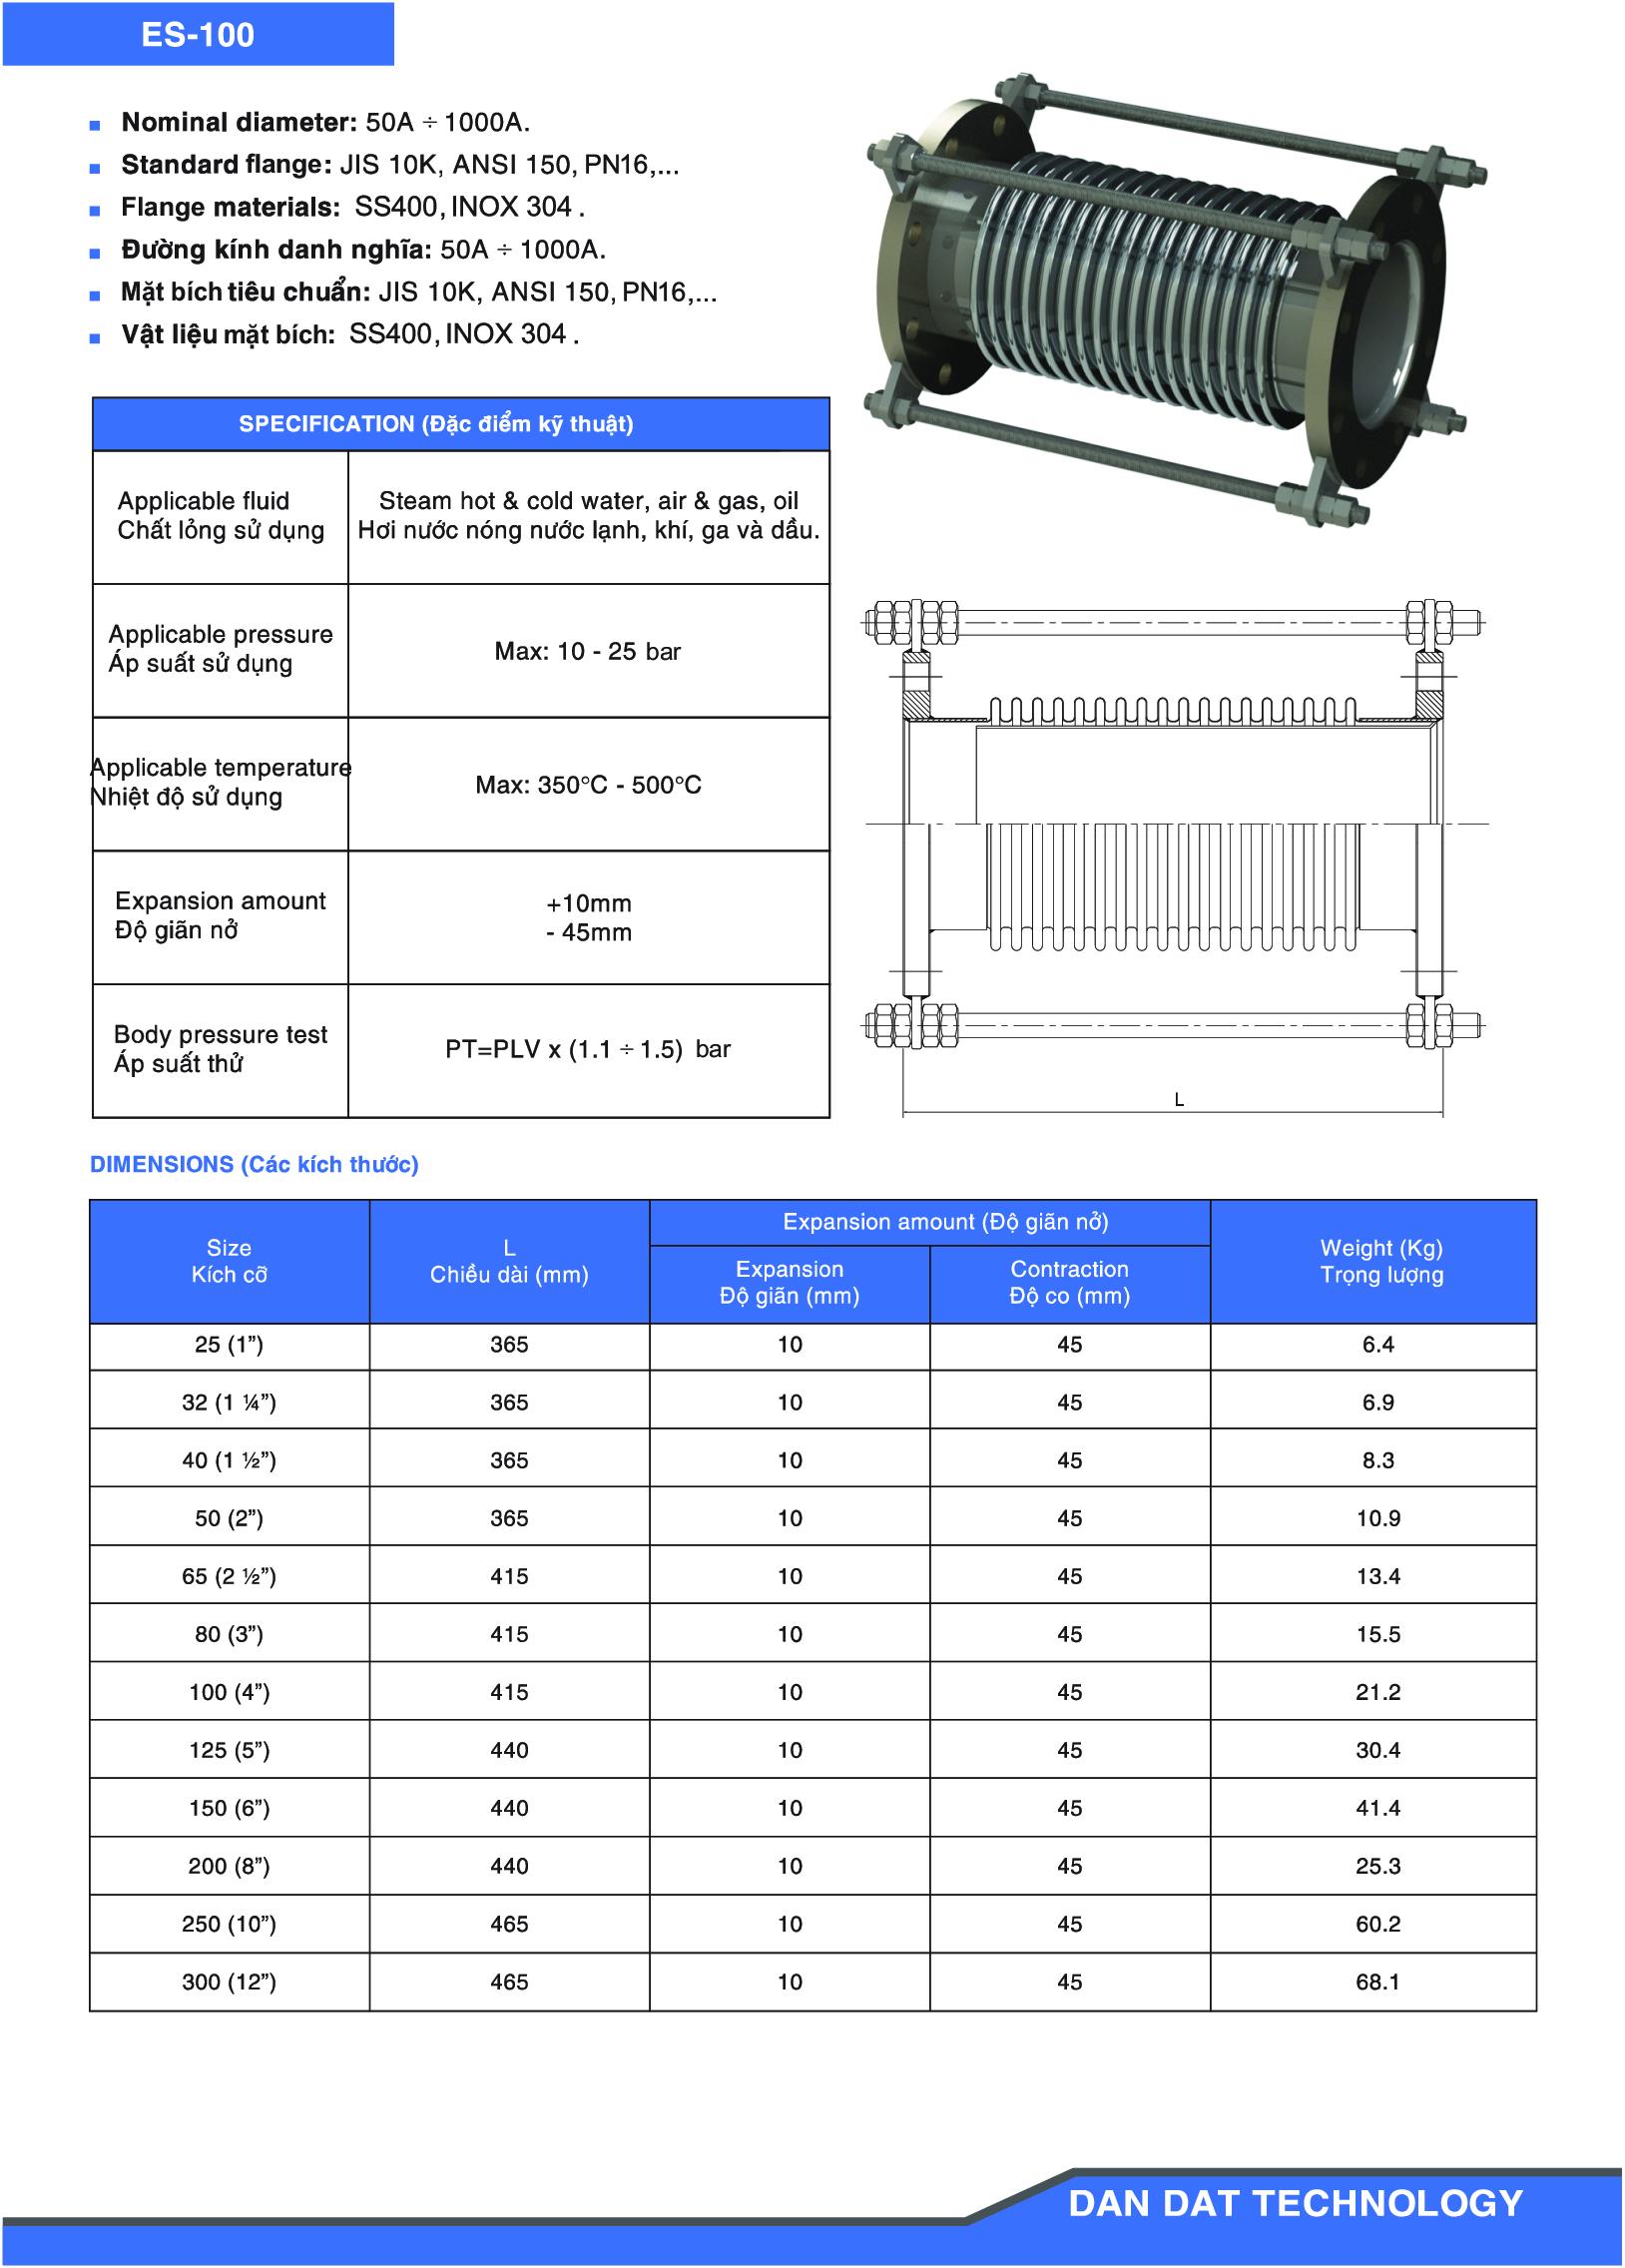 Khớp giãn nở model ES-100